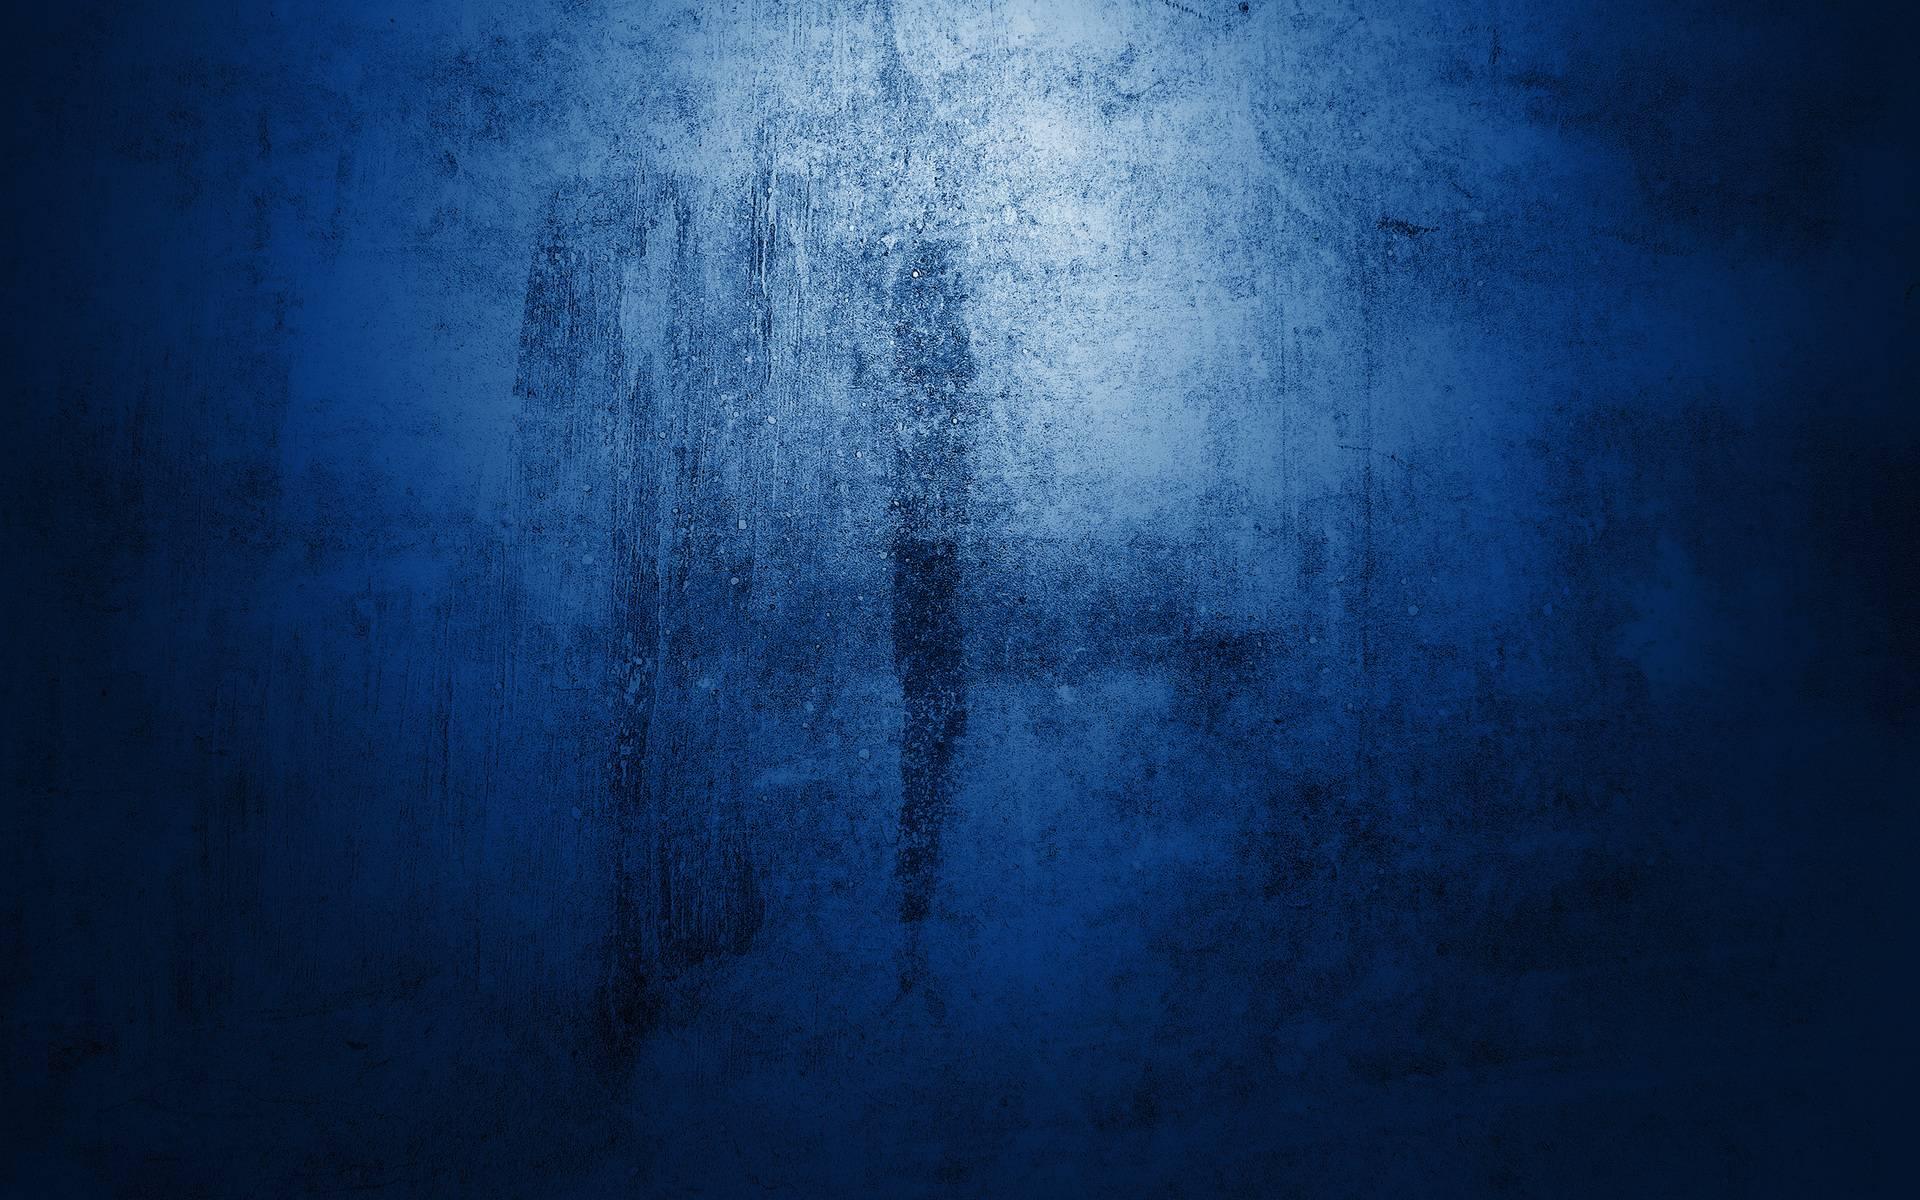 Cool Background Pics - Wallpaper Cave